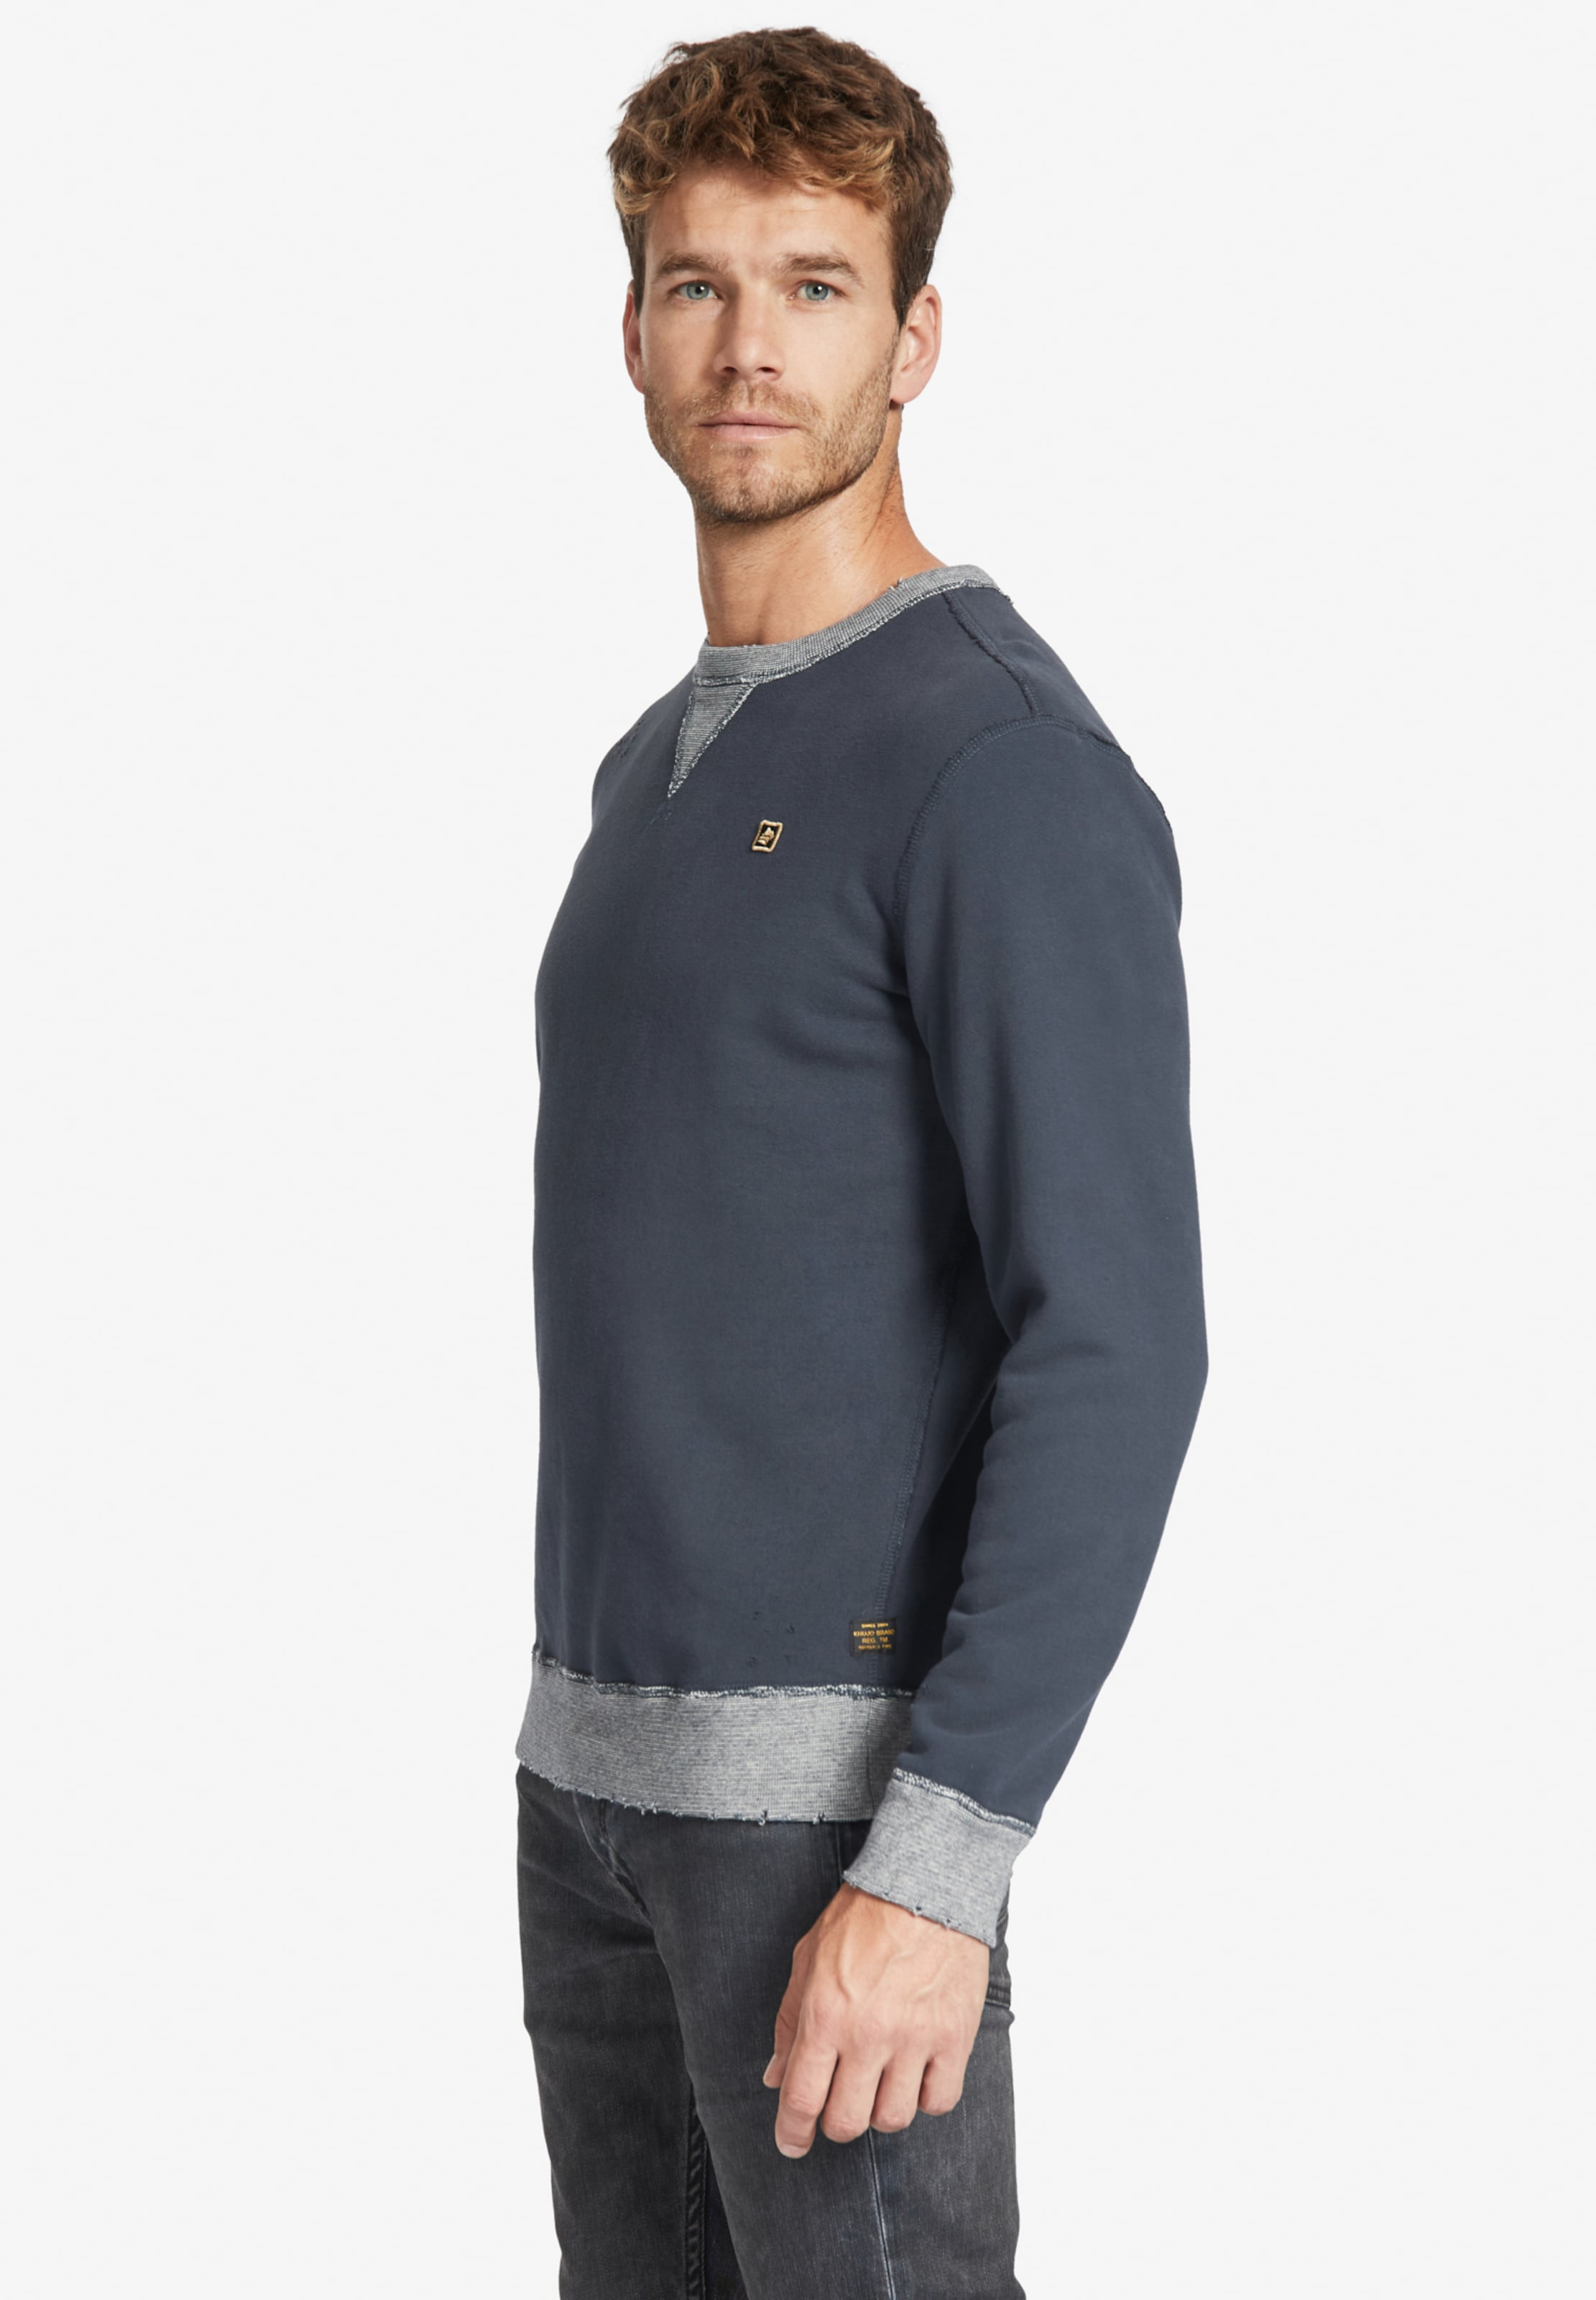 'pendor Number' Sweatshirt NachtblauGrau Khujo In 1TFcJ3lK